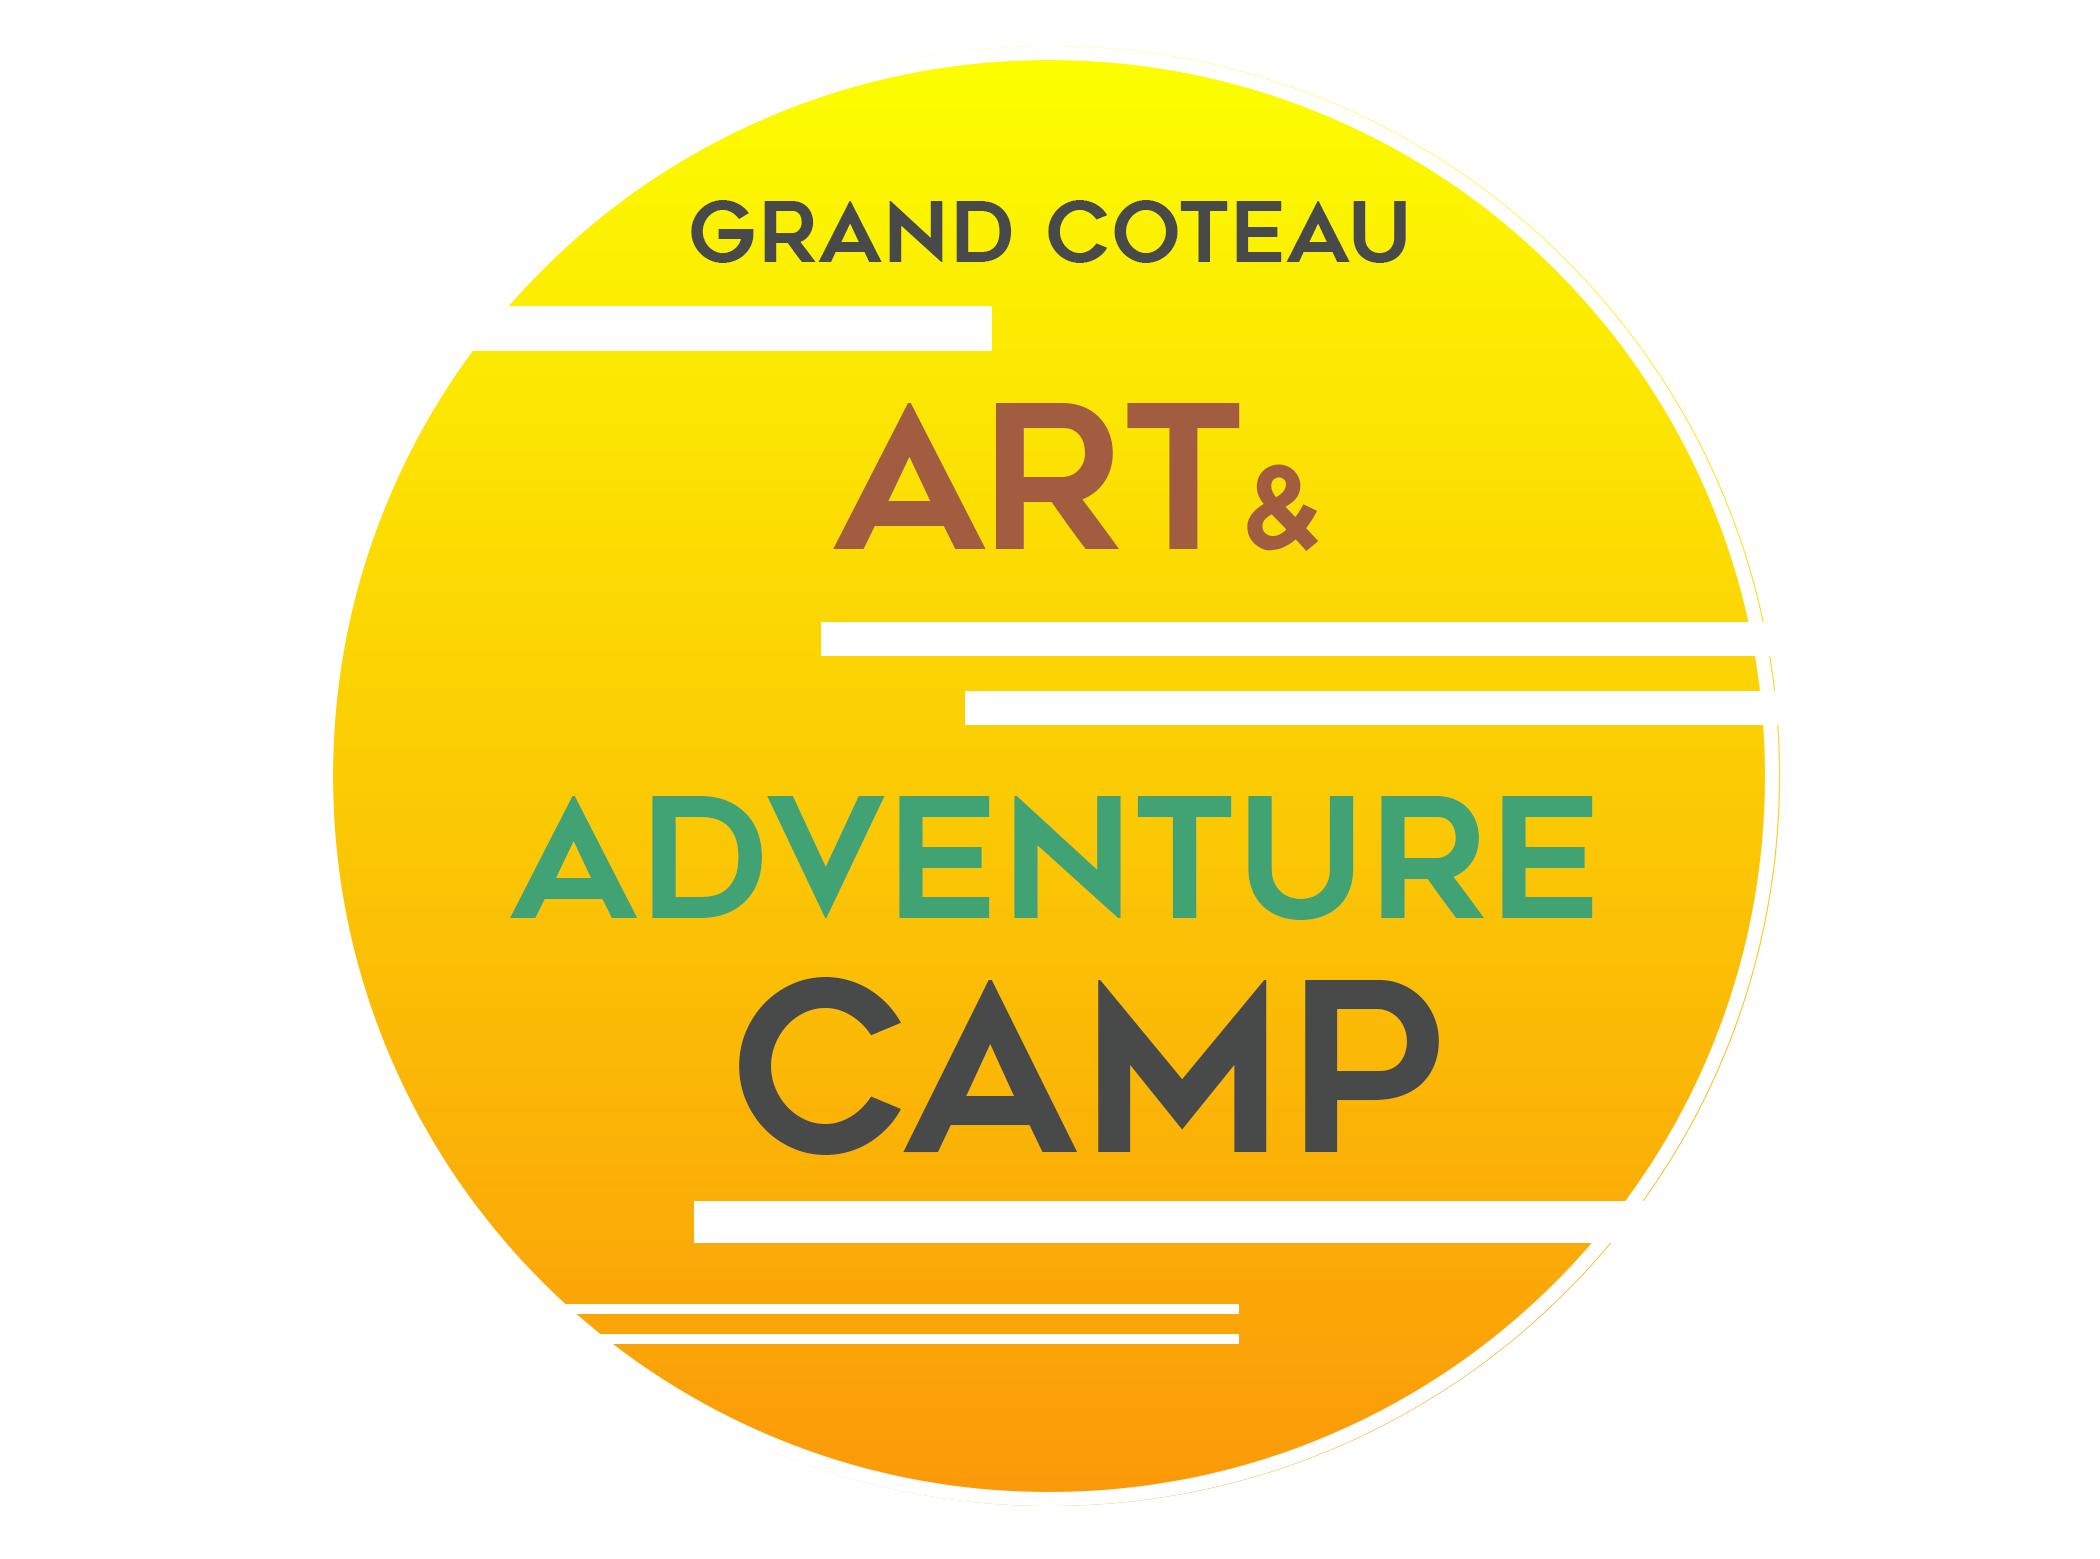 adventurecamp.png